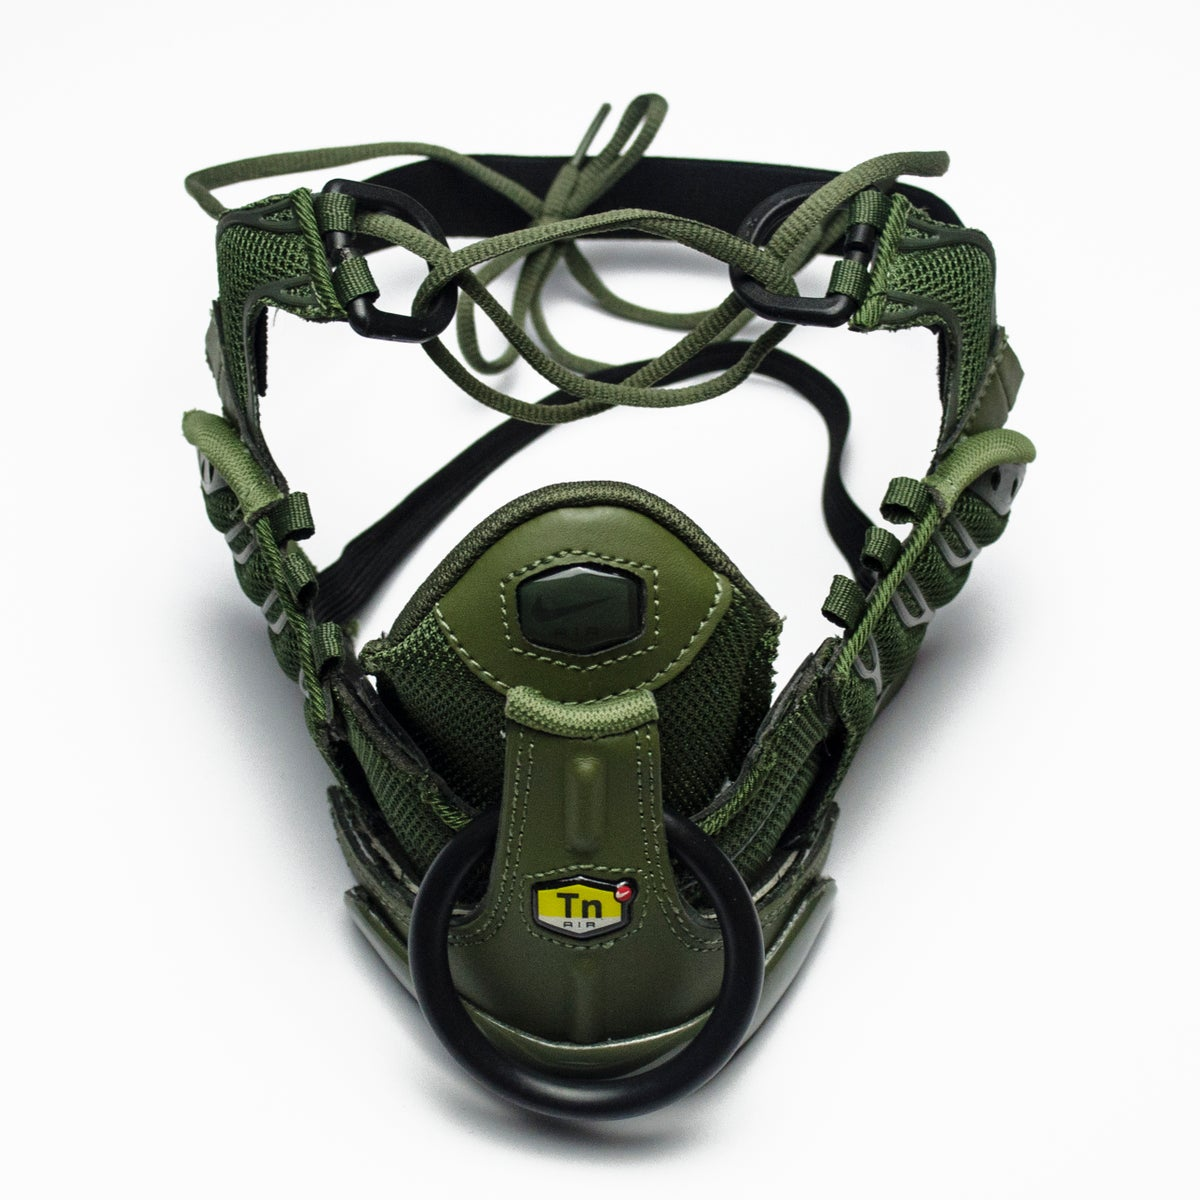 Image of TACTICAL RING MASK / SNEAKER MASK / KHAKI - BLACK )